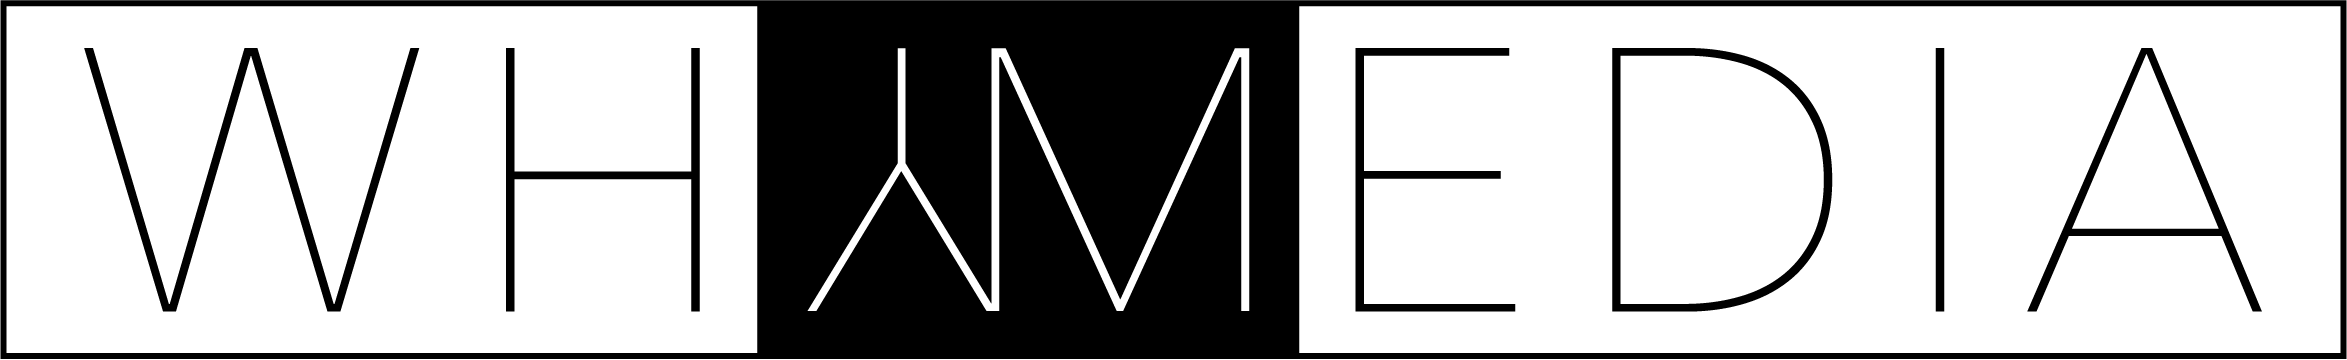 WHYMEDIA logo